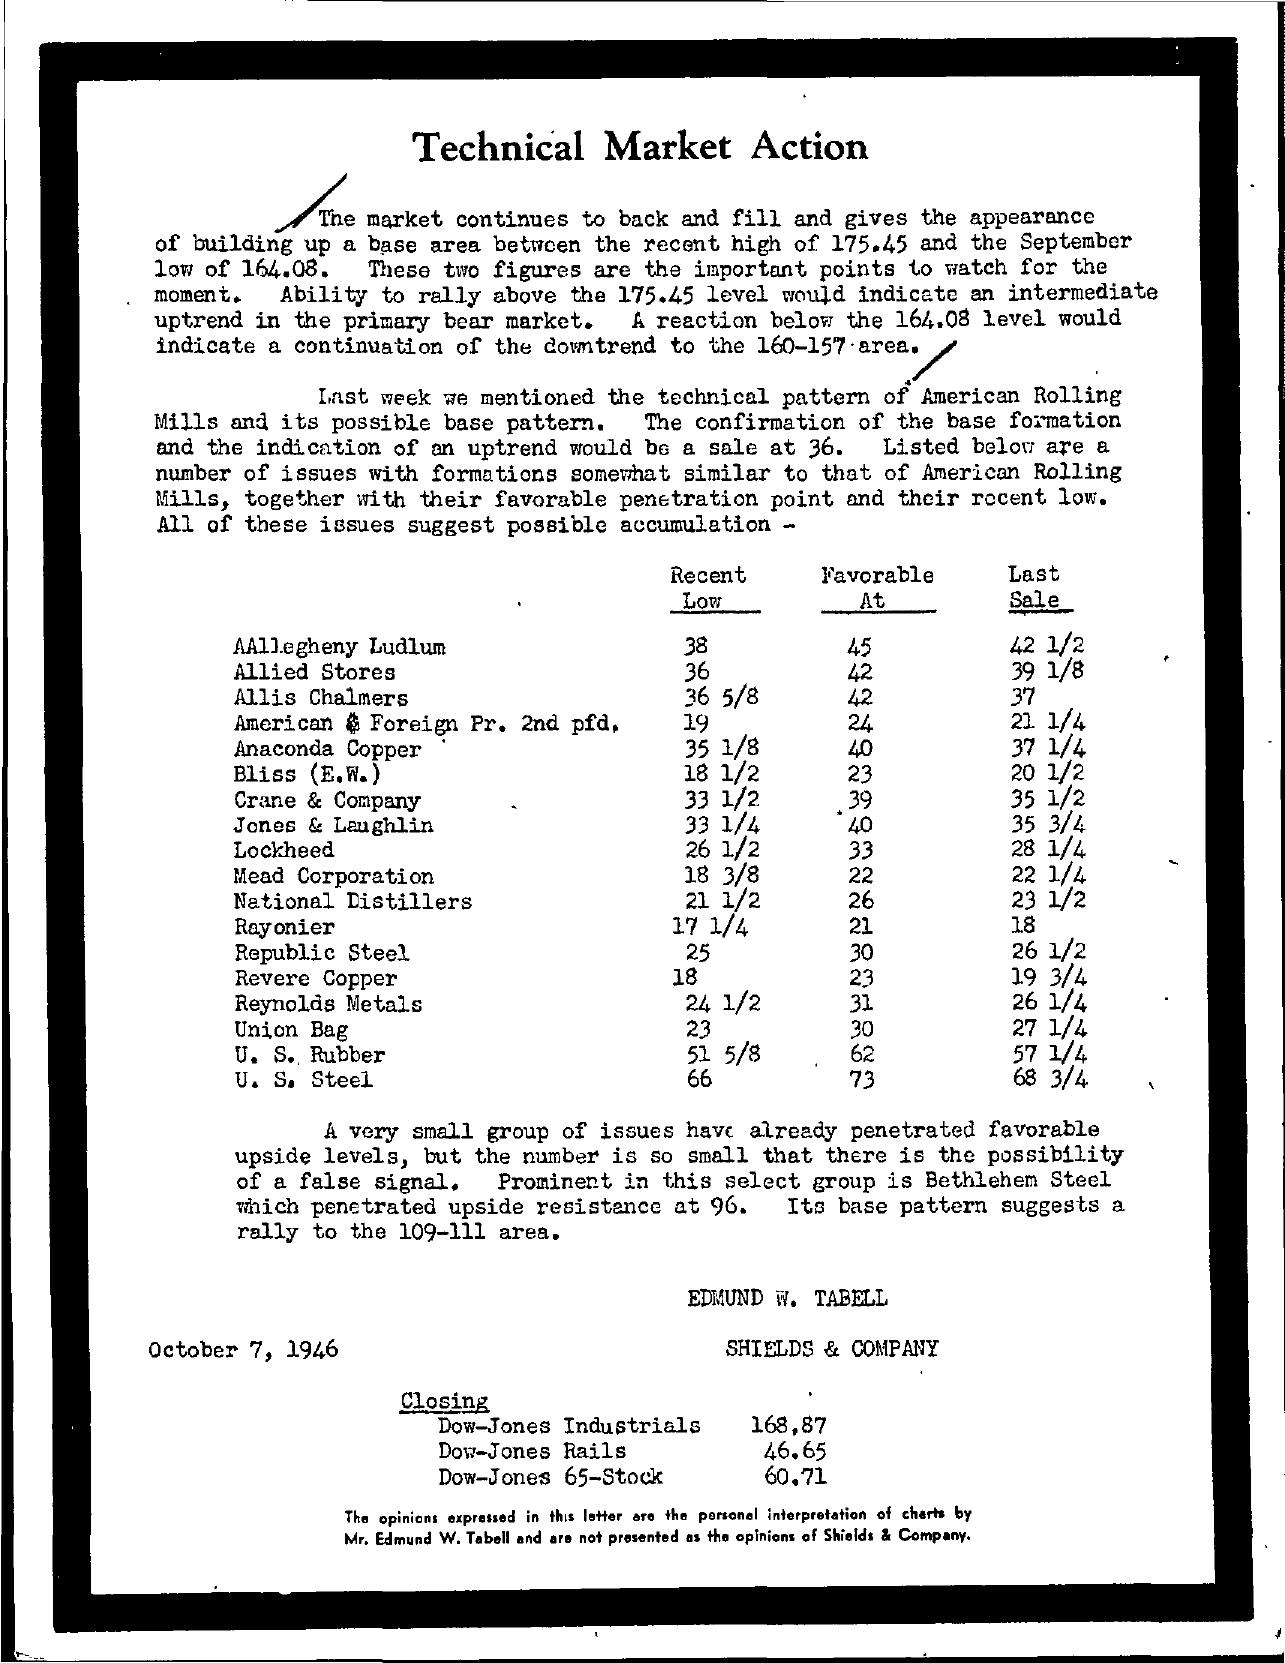 Tabell's Market Letter - October 07, 1946